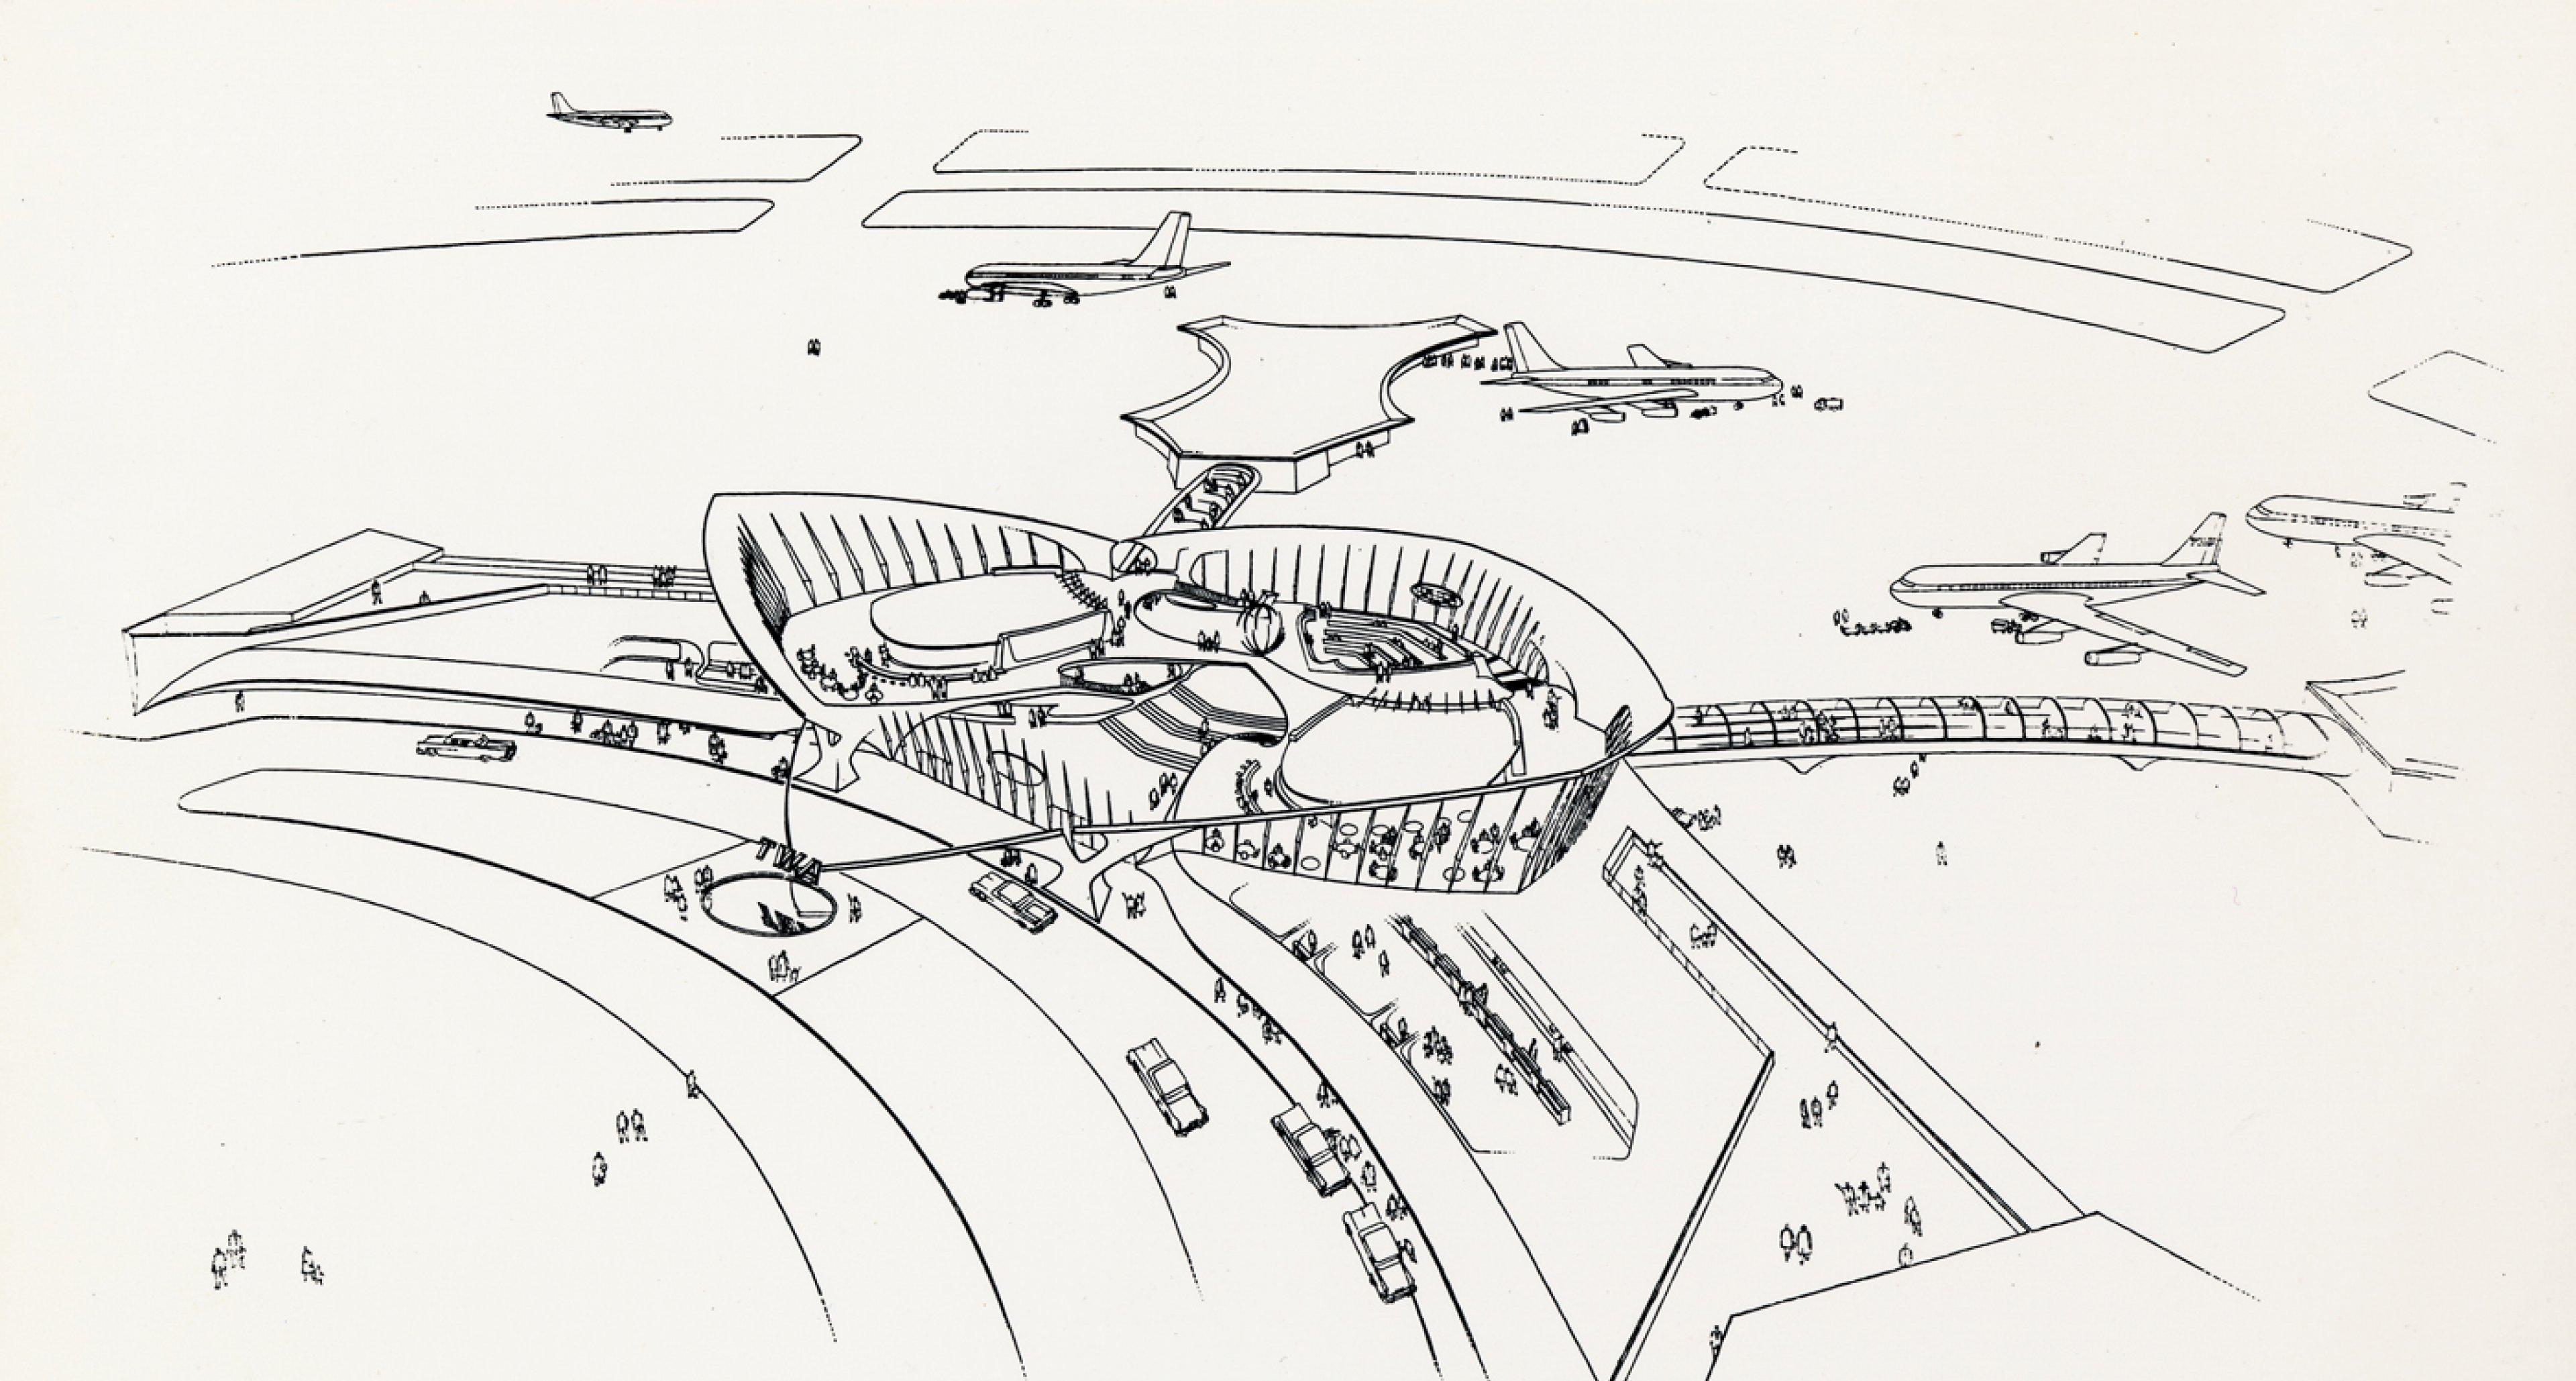 Erster Entwurf von ES&A für den Terminal © Eero Saarinen Collection (MS 593). Manuscripts and Archives, Yale University Library